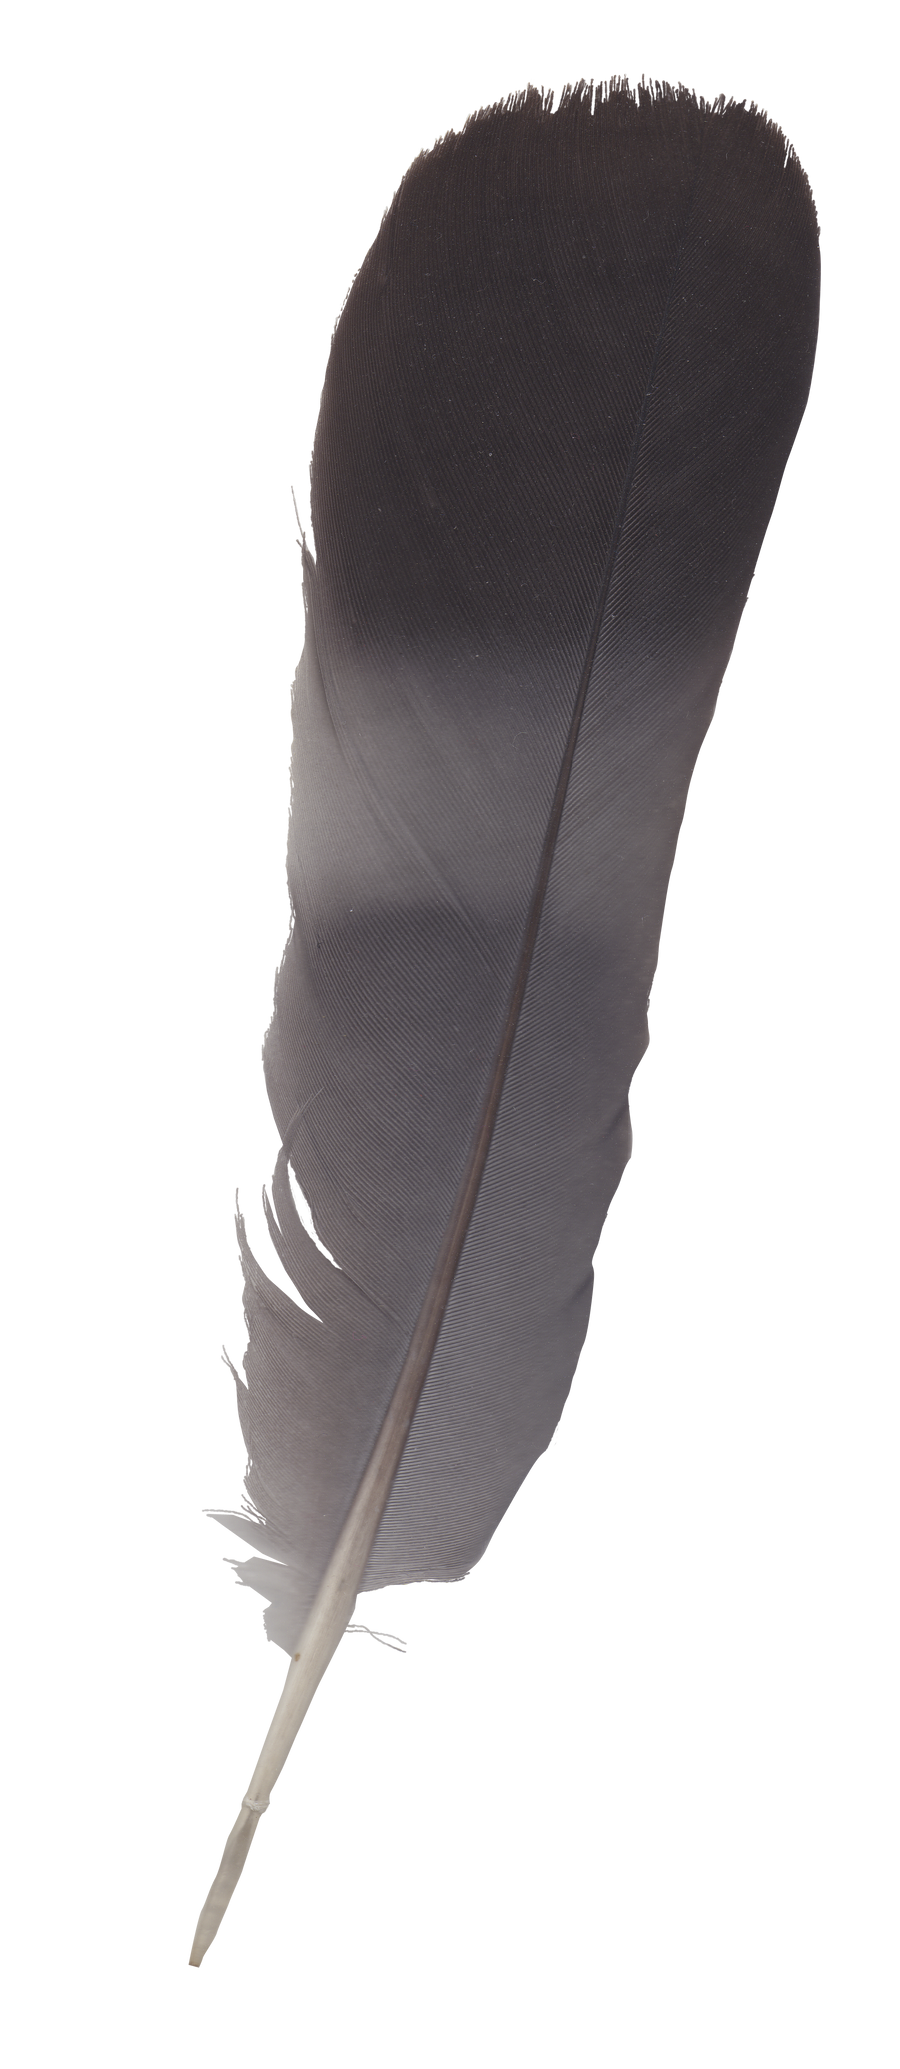 feather - cutout by Didier-Bernard